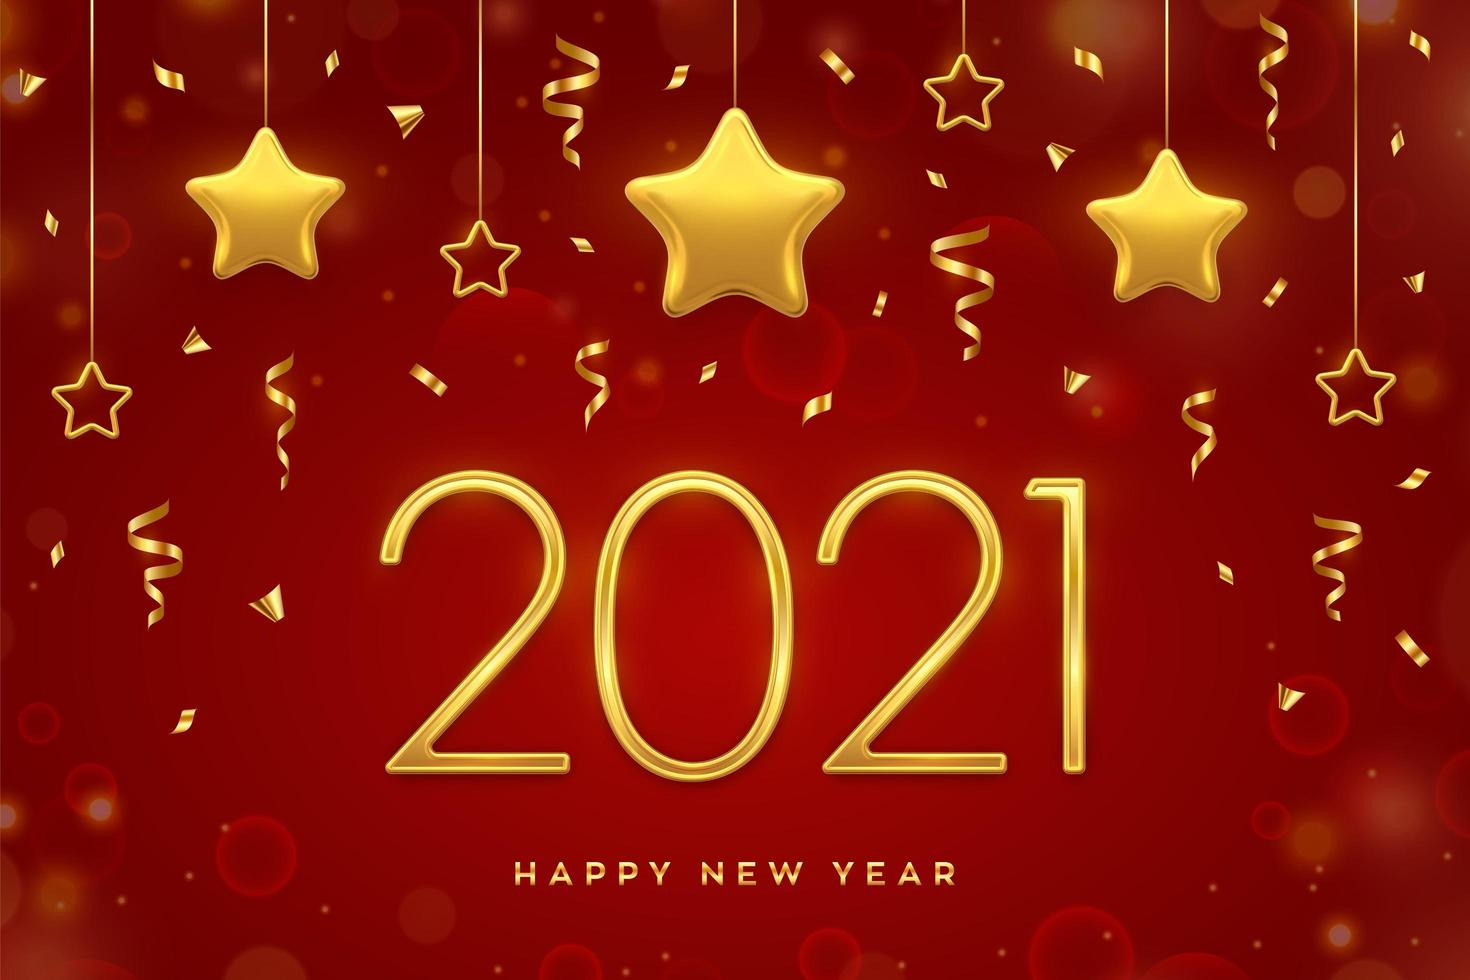 texto dourado de ano novo e estrelas suspensas vetor